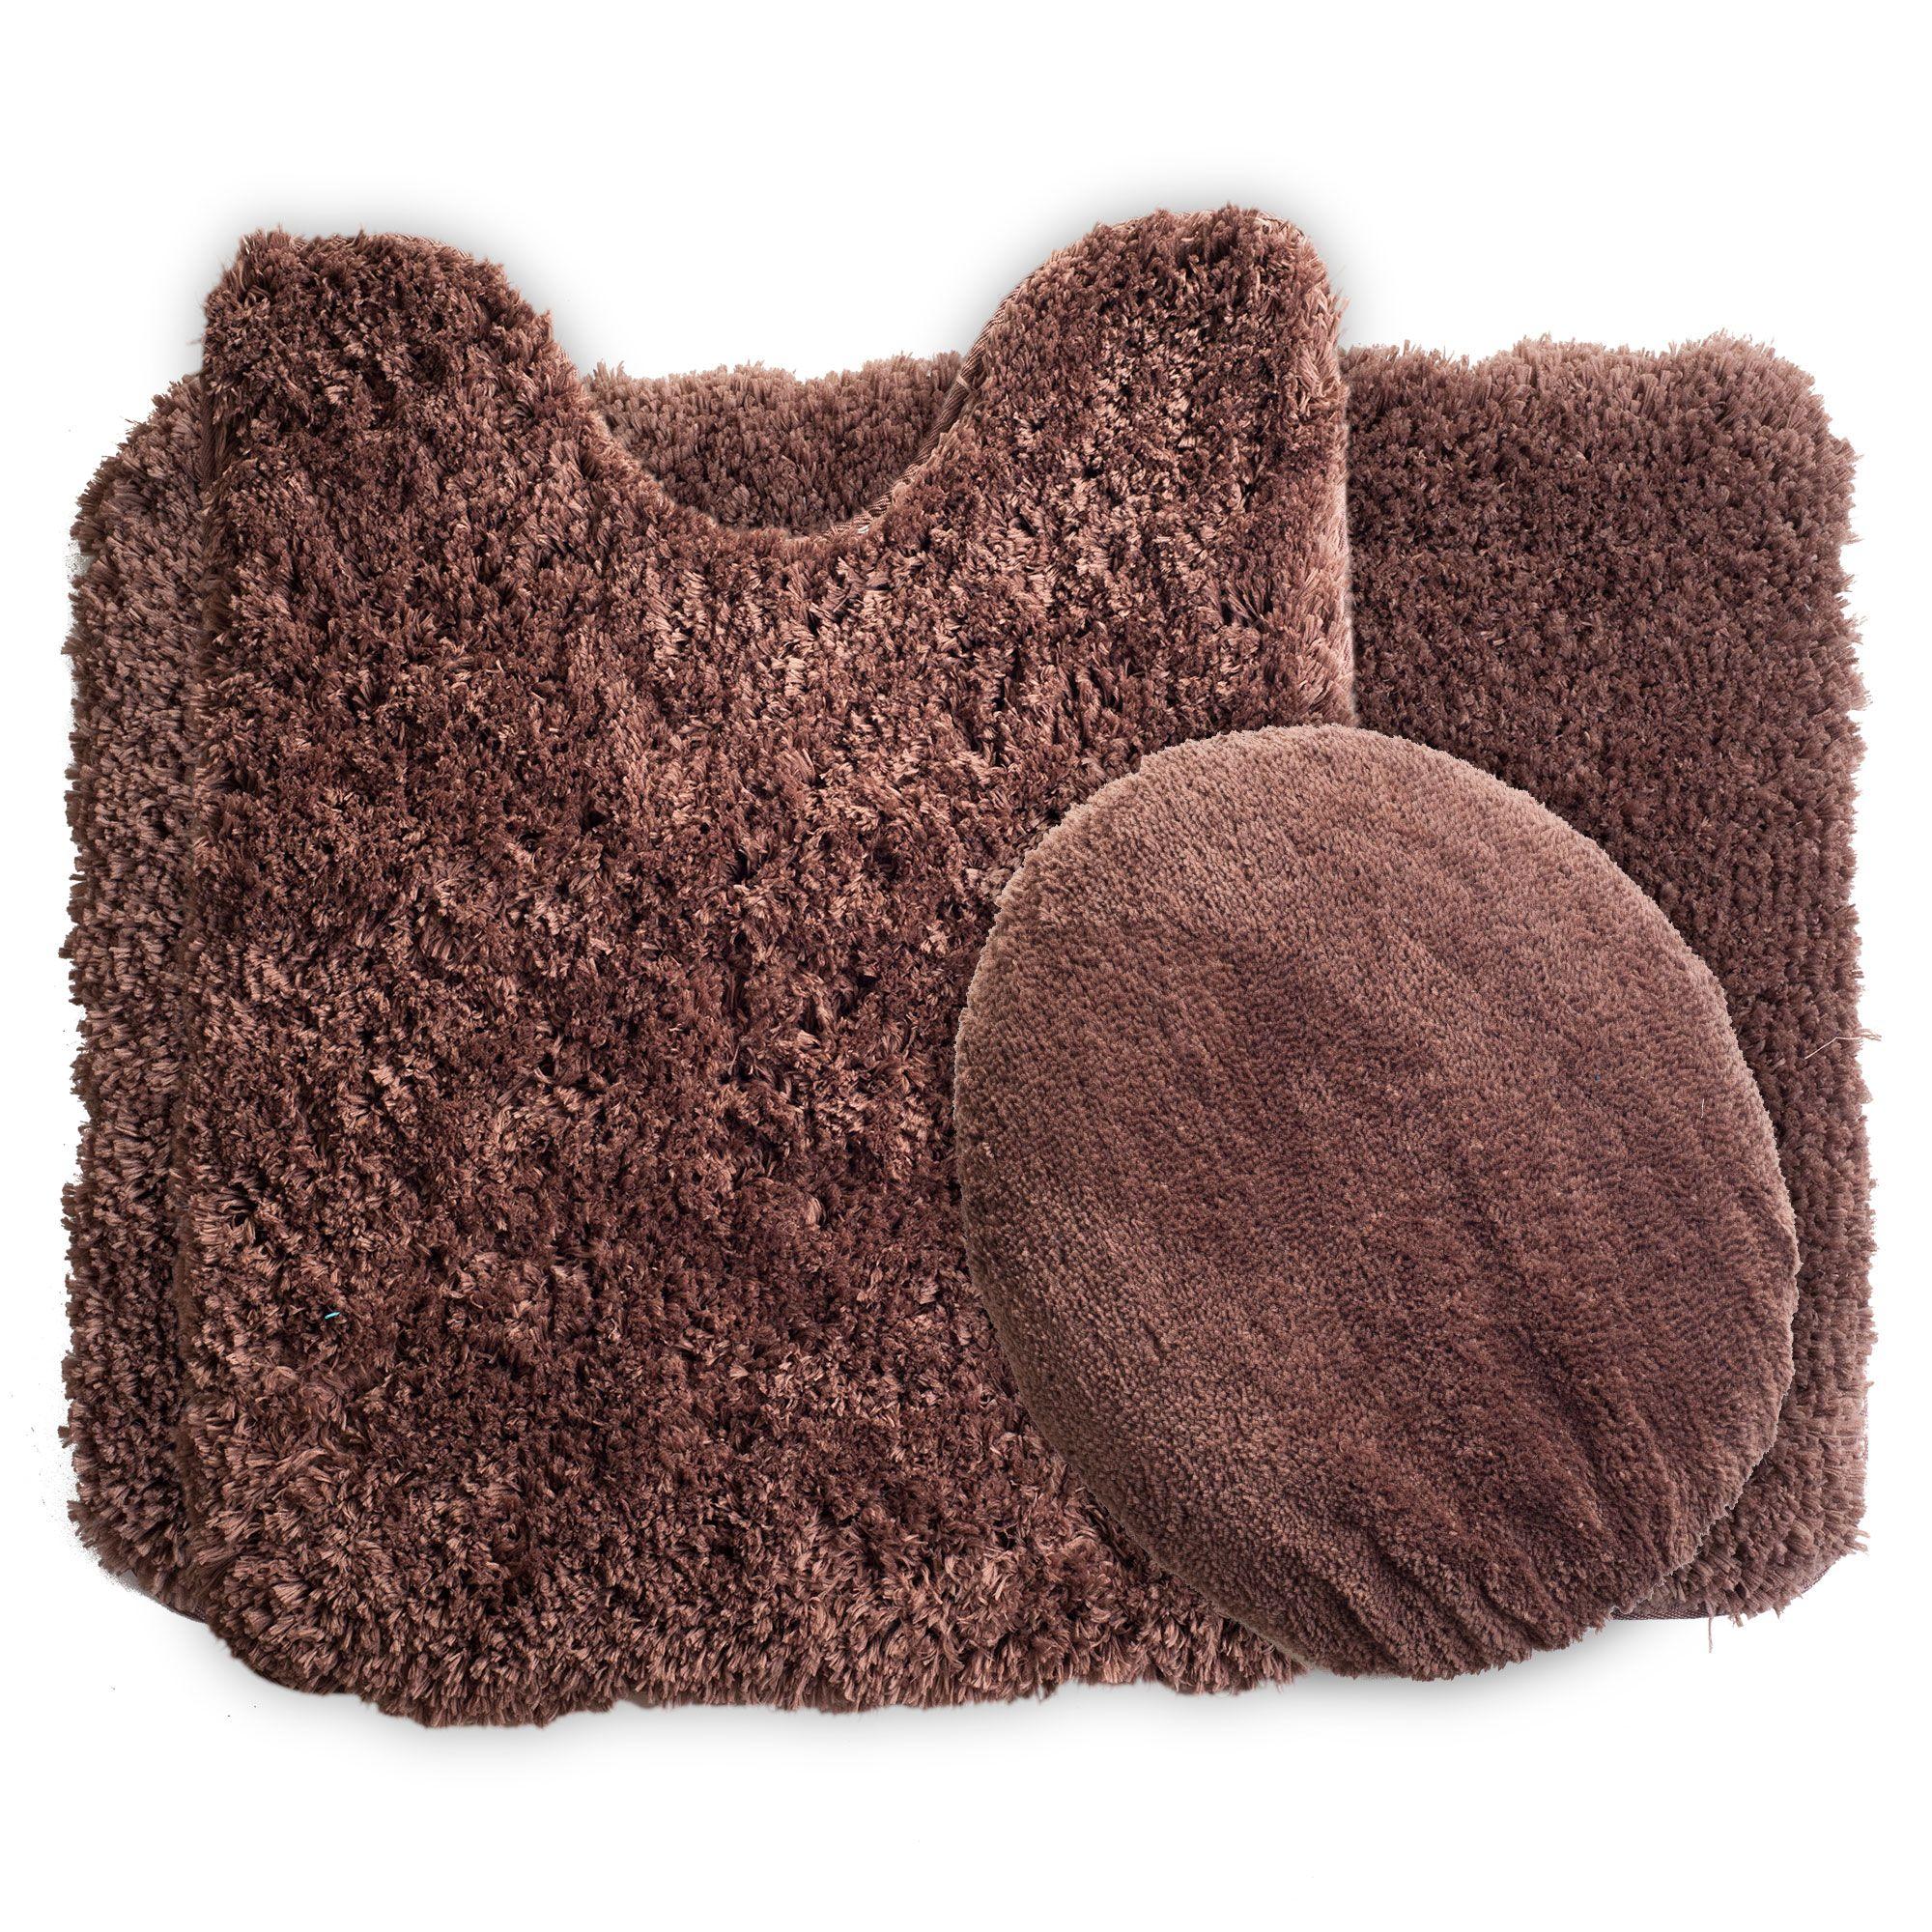 6 Piece Super Plush Non-Slip Bath Mat Rug Set - Kmart  Bath mat